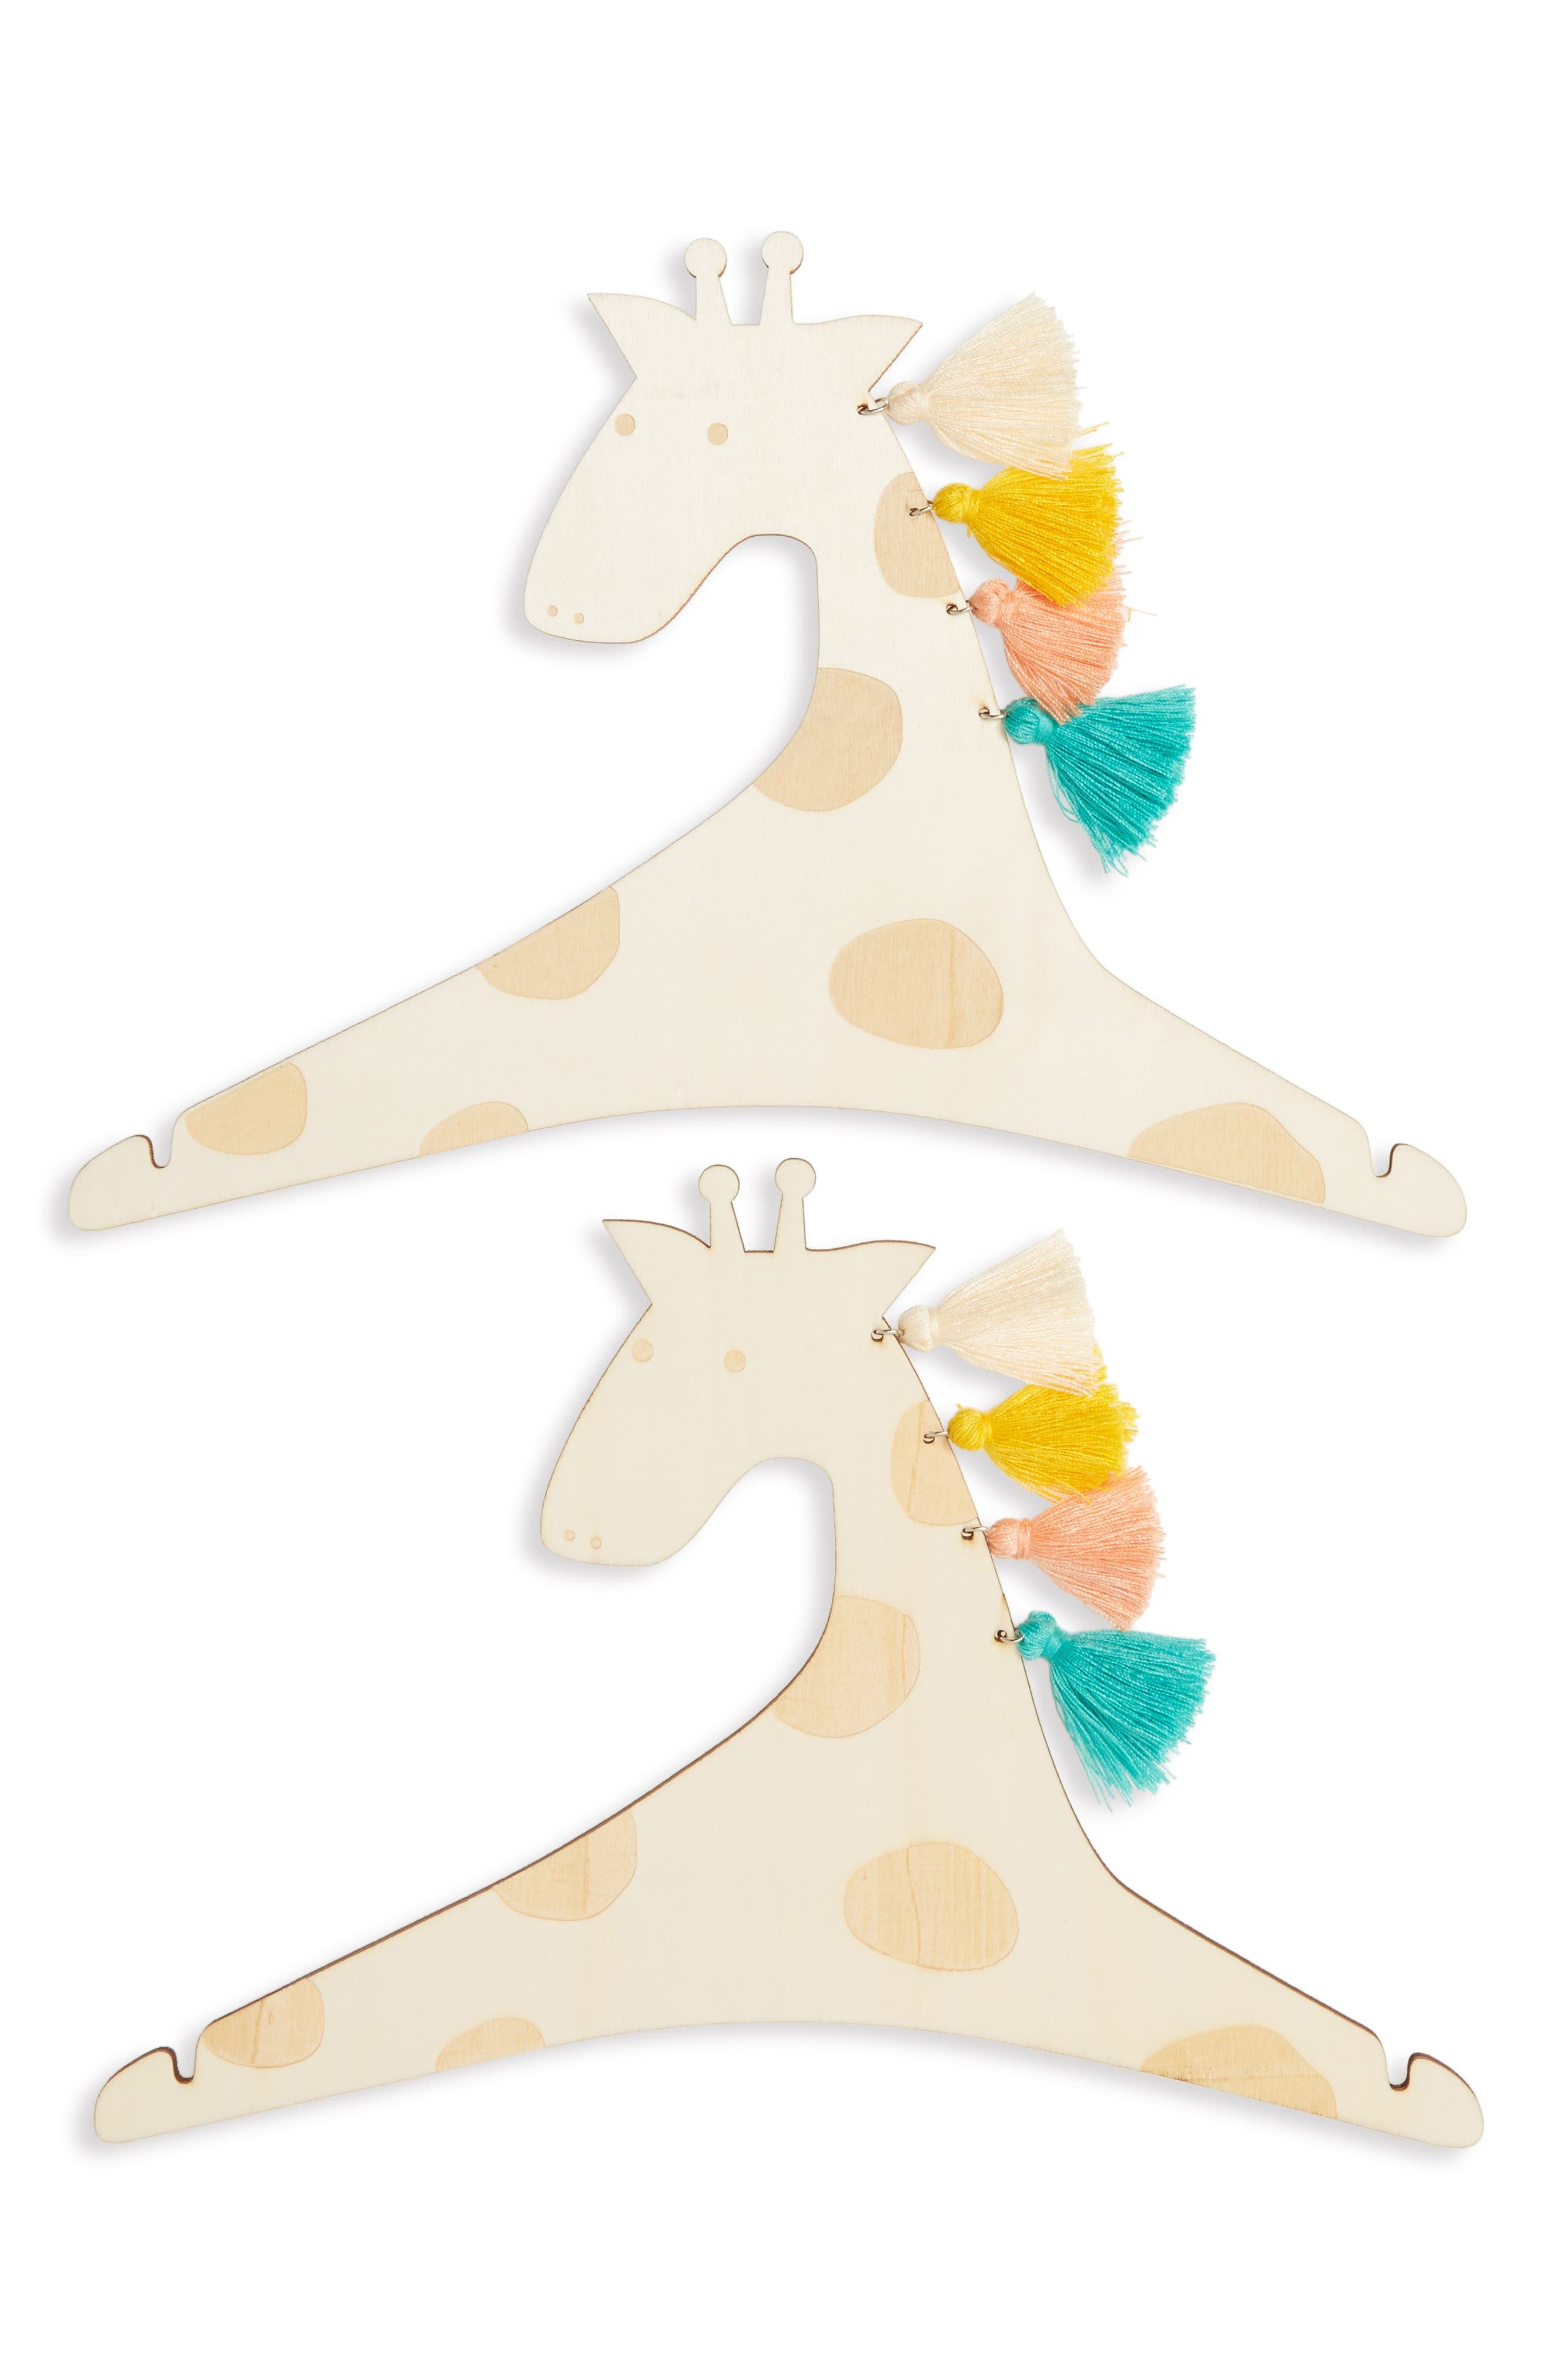 Set of 2 Giraffe Hangers,                             Main thumbnail 1, color,                             250